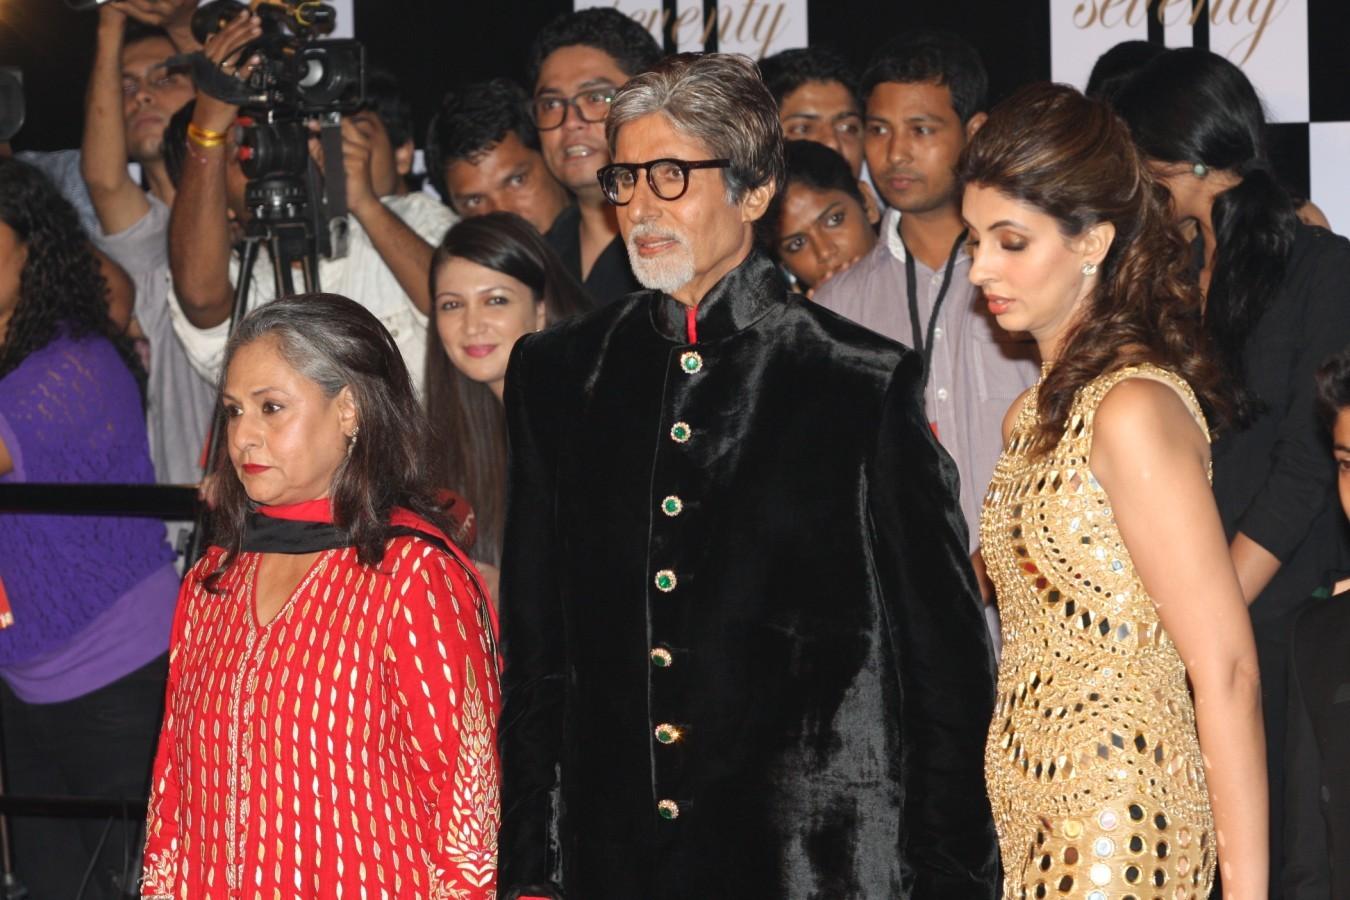 http://2.bp.blogspot.com/-lrKduhT8y_o/UHuHIkawwzI/AAAAAAAADAk/ZcqB997aM-Q/s1600/70th-Birthday-Party-of-Amitabh-Bachchan-at-Reliance-Media-Works-in-Mumbai.jpg